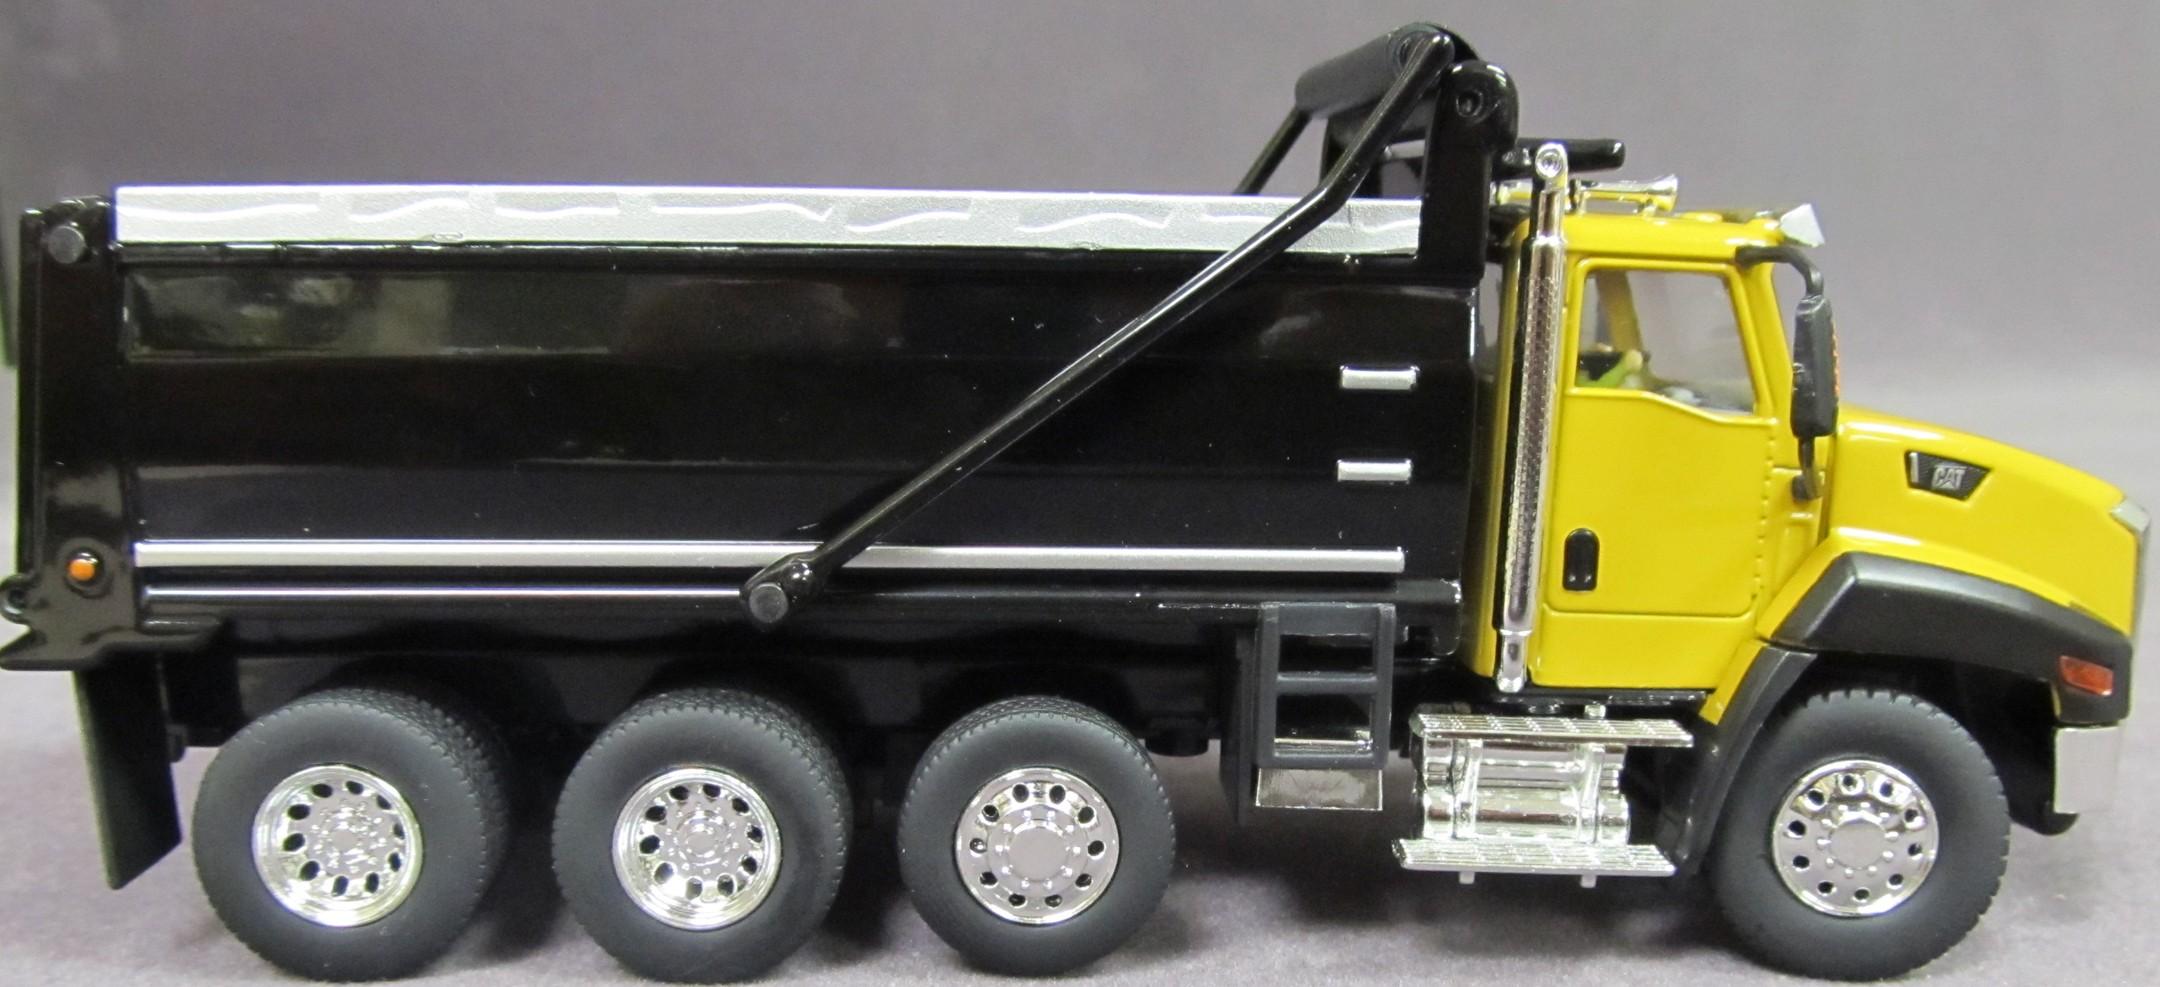 Caterpillar Ct660 Yellow Dump Truck Diecast Masters